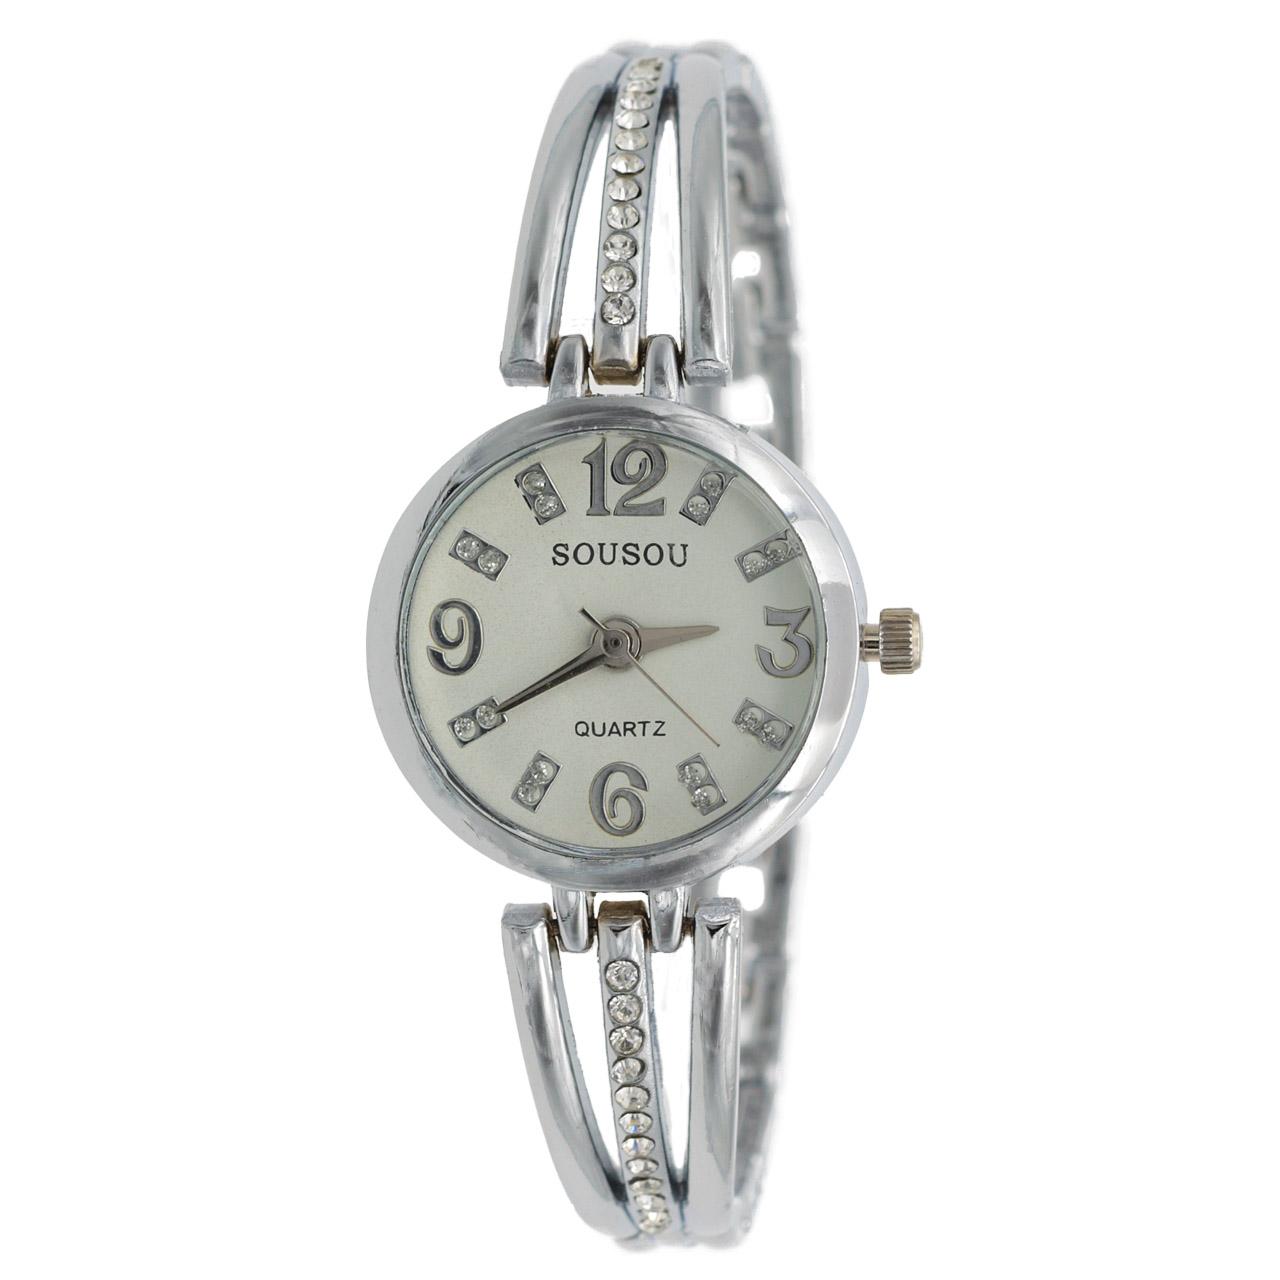 ساعت زنانه برند کارتیسی کد W2148